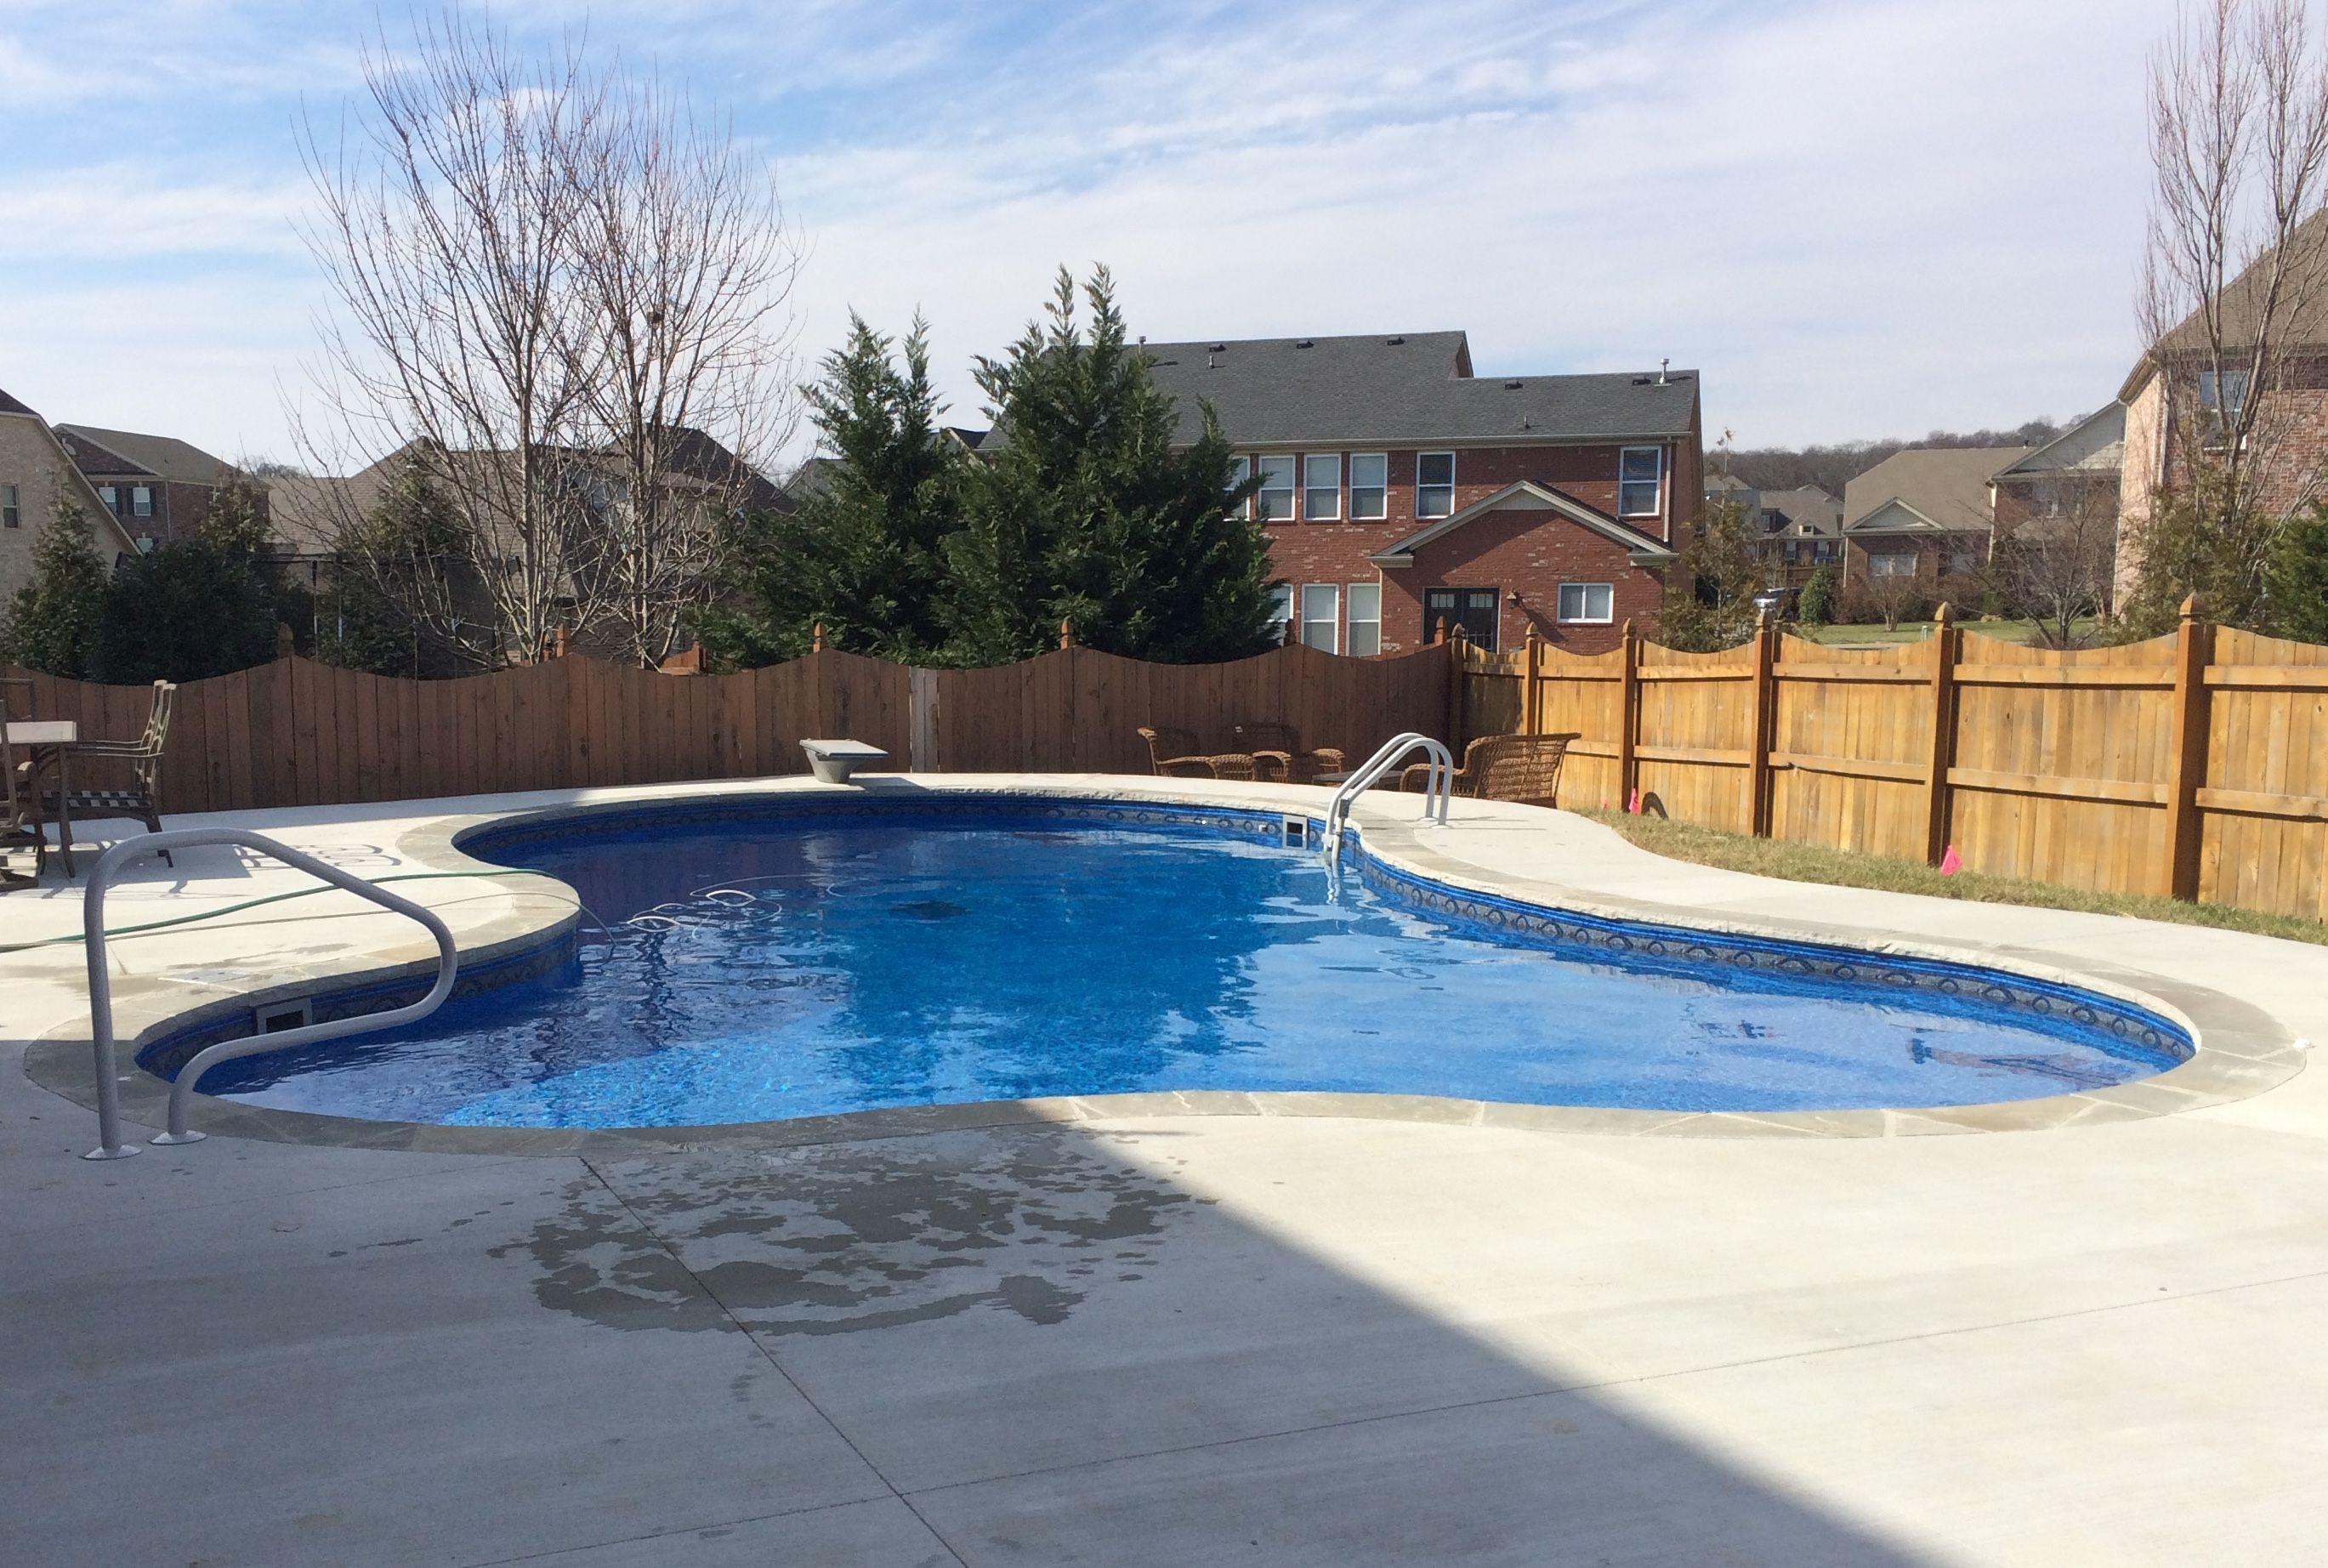 Concrete Wall Pools Nashville Pool Designer Brentwood Bowling